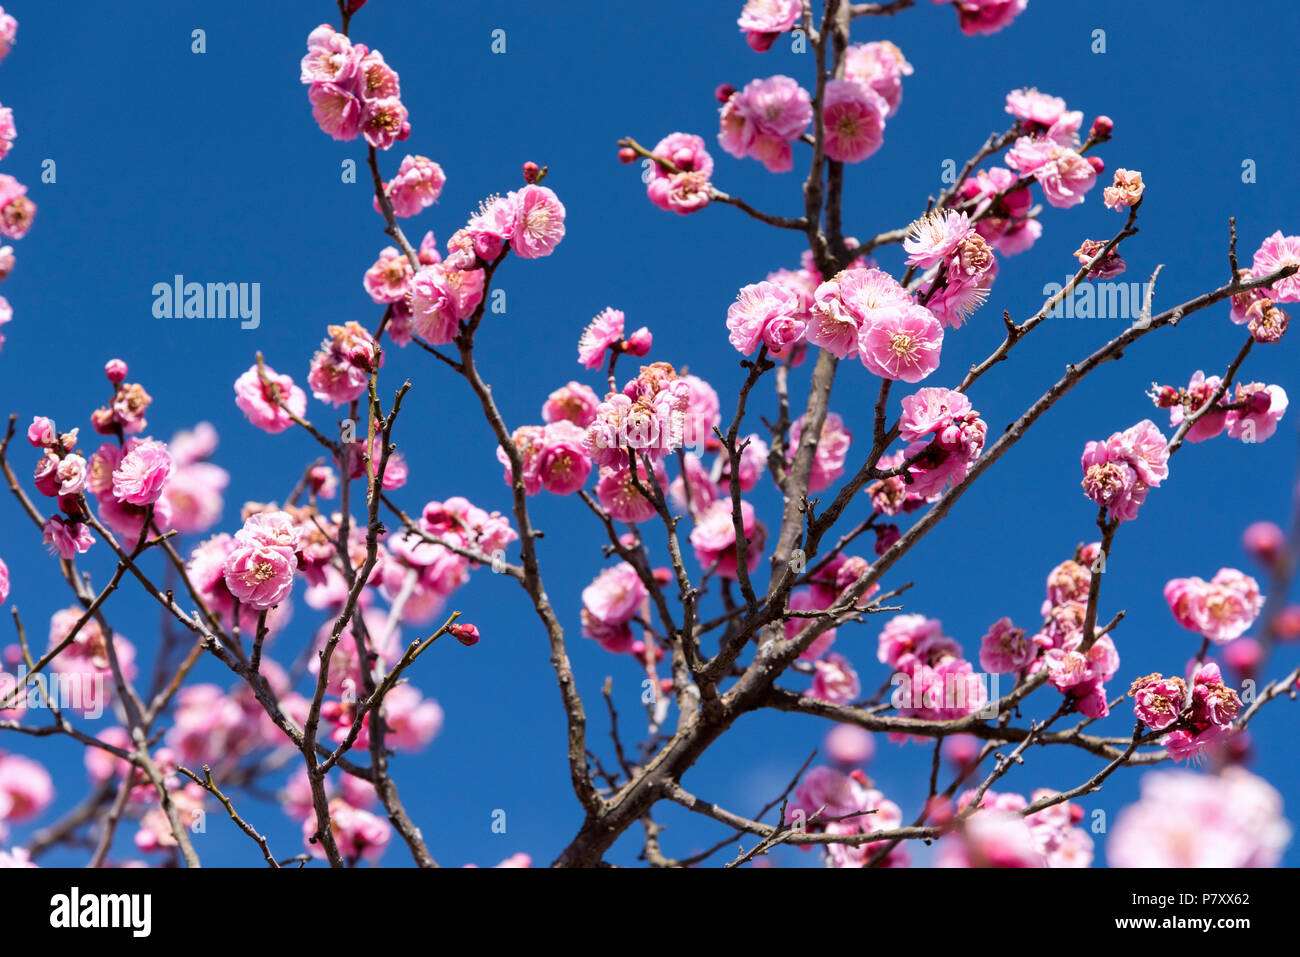 Rosa Blüten Cherry Plum tree, Japan Blume, Schönheit Konzept, japanisches Spa Konzept Stockbild